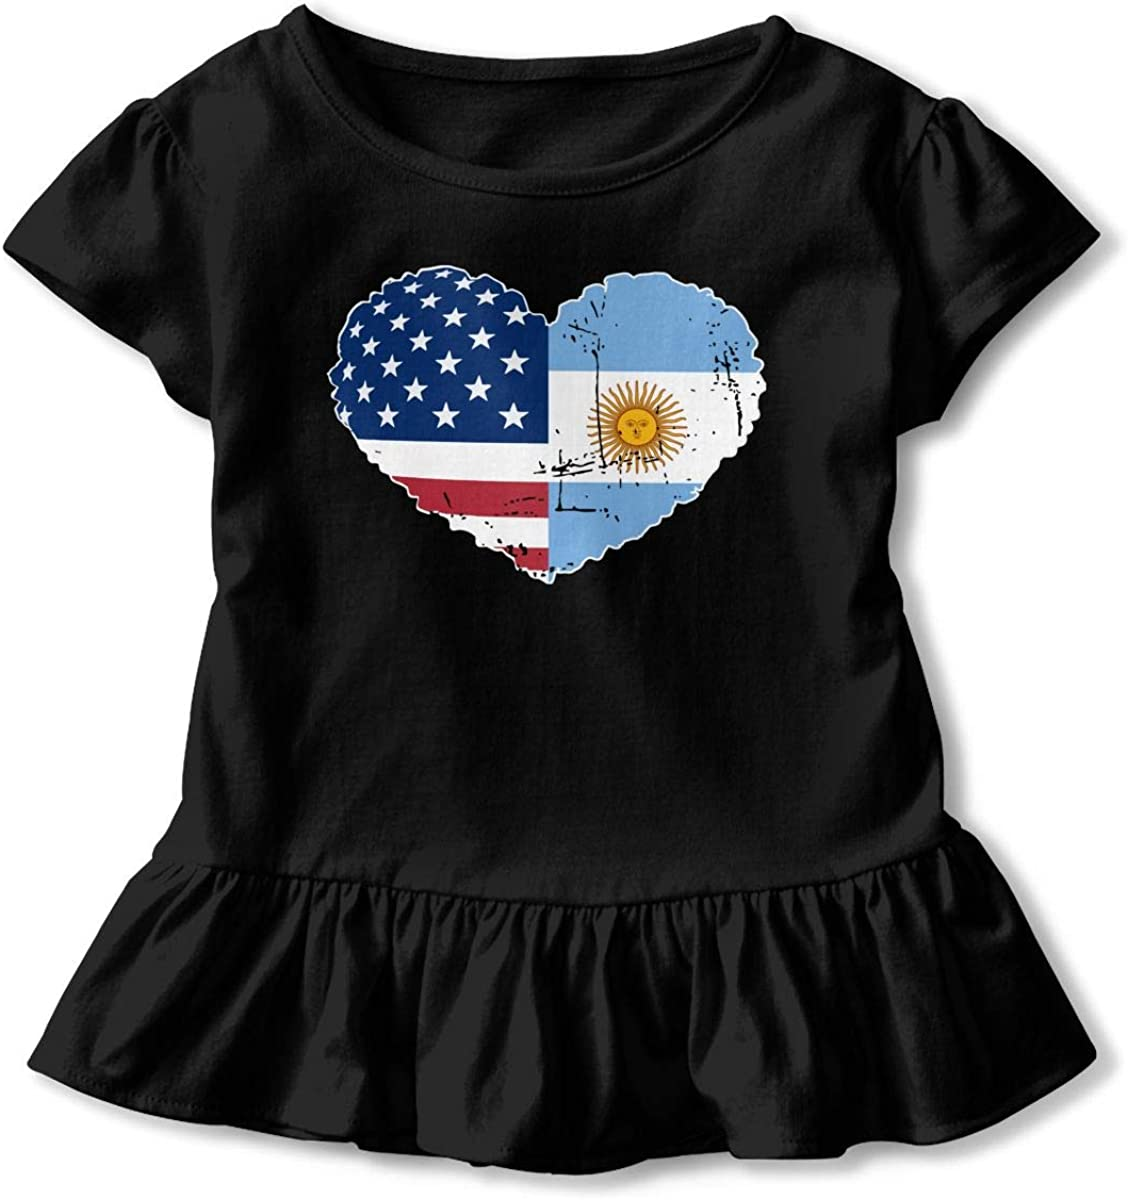 2-6 Years Vfbggg-Shirt Argentina USA Flag Heart Baby Girls Short Sleeve Ruffle Tee Cotton Kids T Shirts